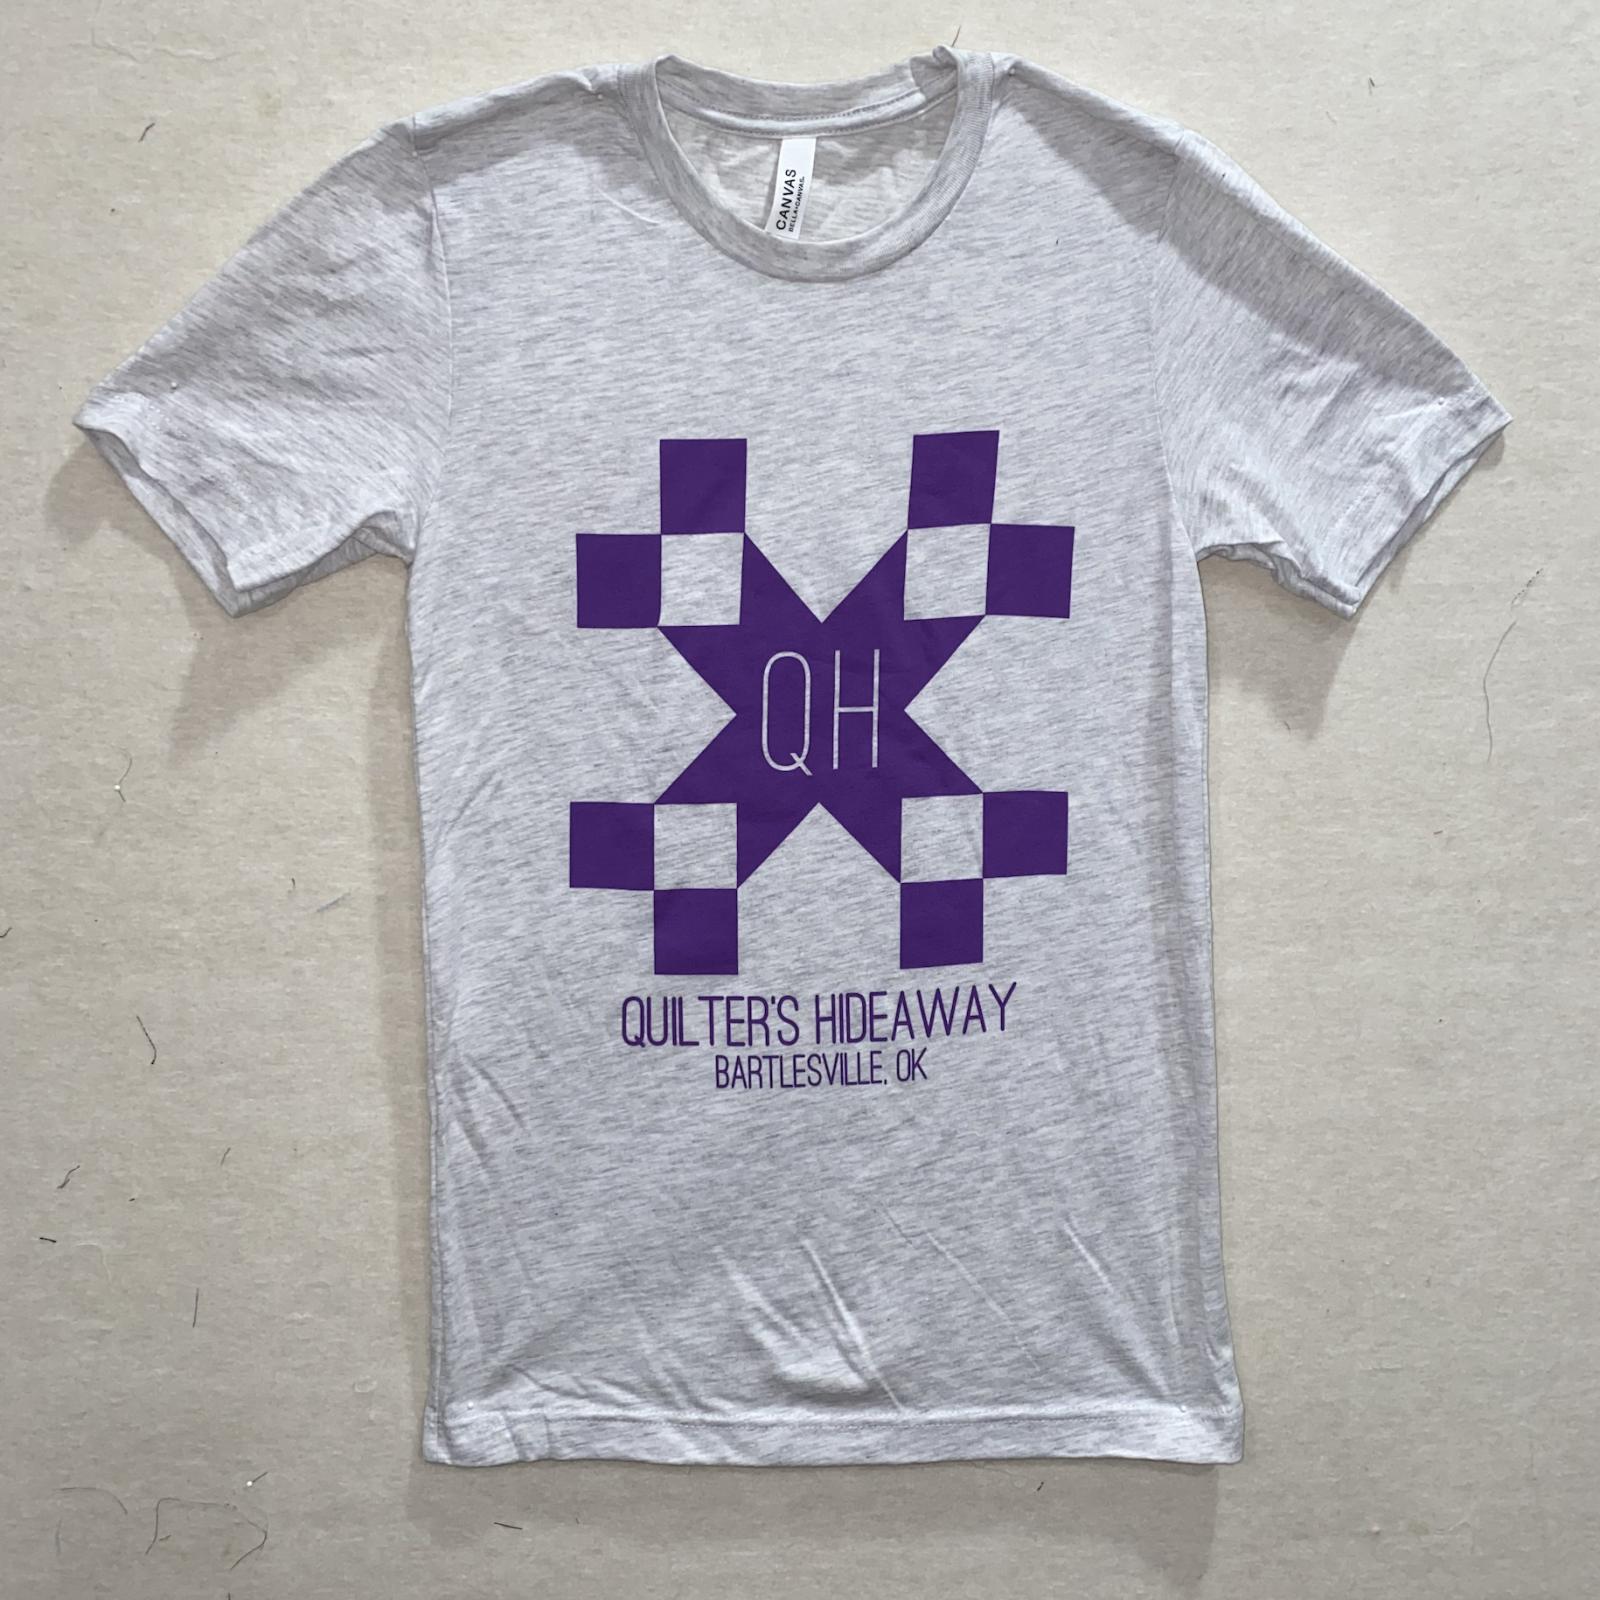 QH Ash Short Sleeve T Shirt - 3XL